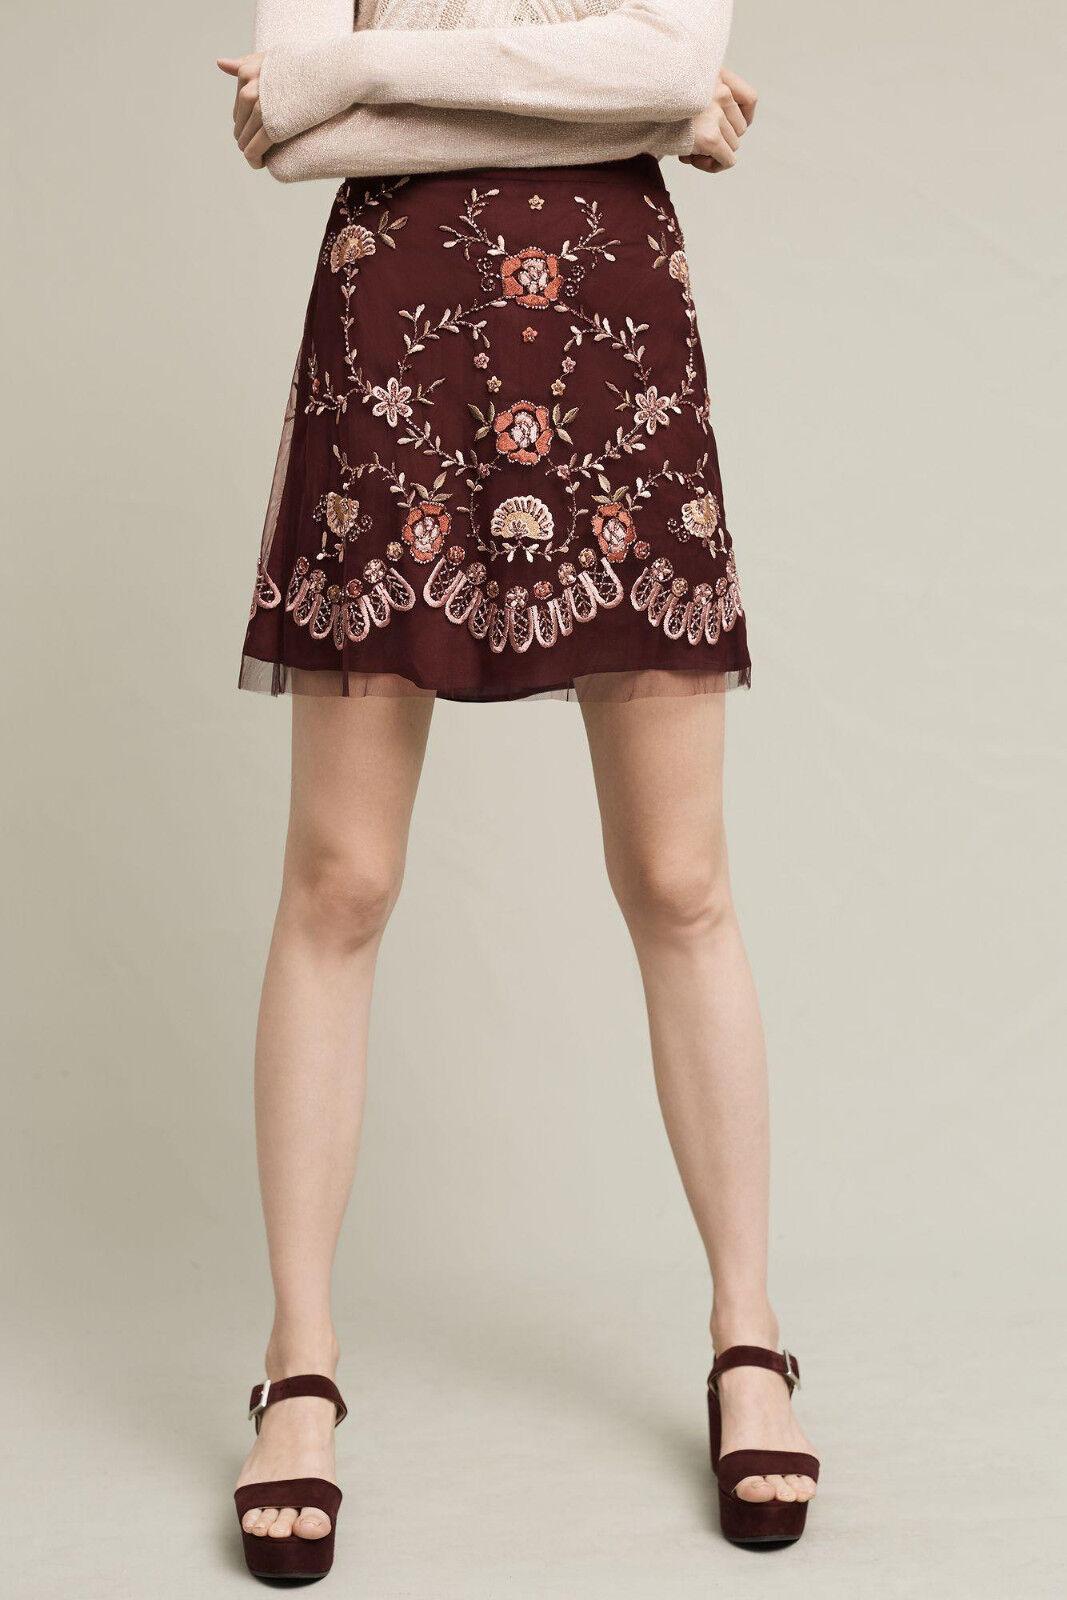 NWT - ANTHROPOLOGIE - RANNA GILL - Regal Embroidered Mini Skirt XS (Plum)  198